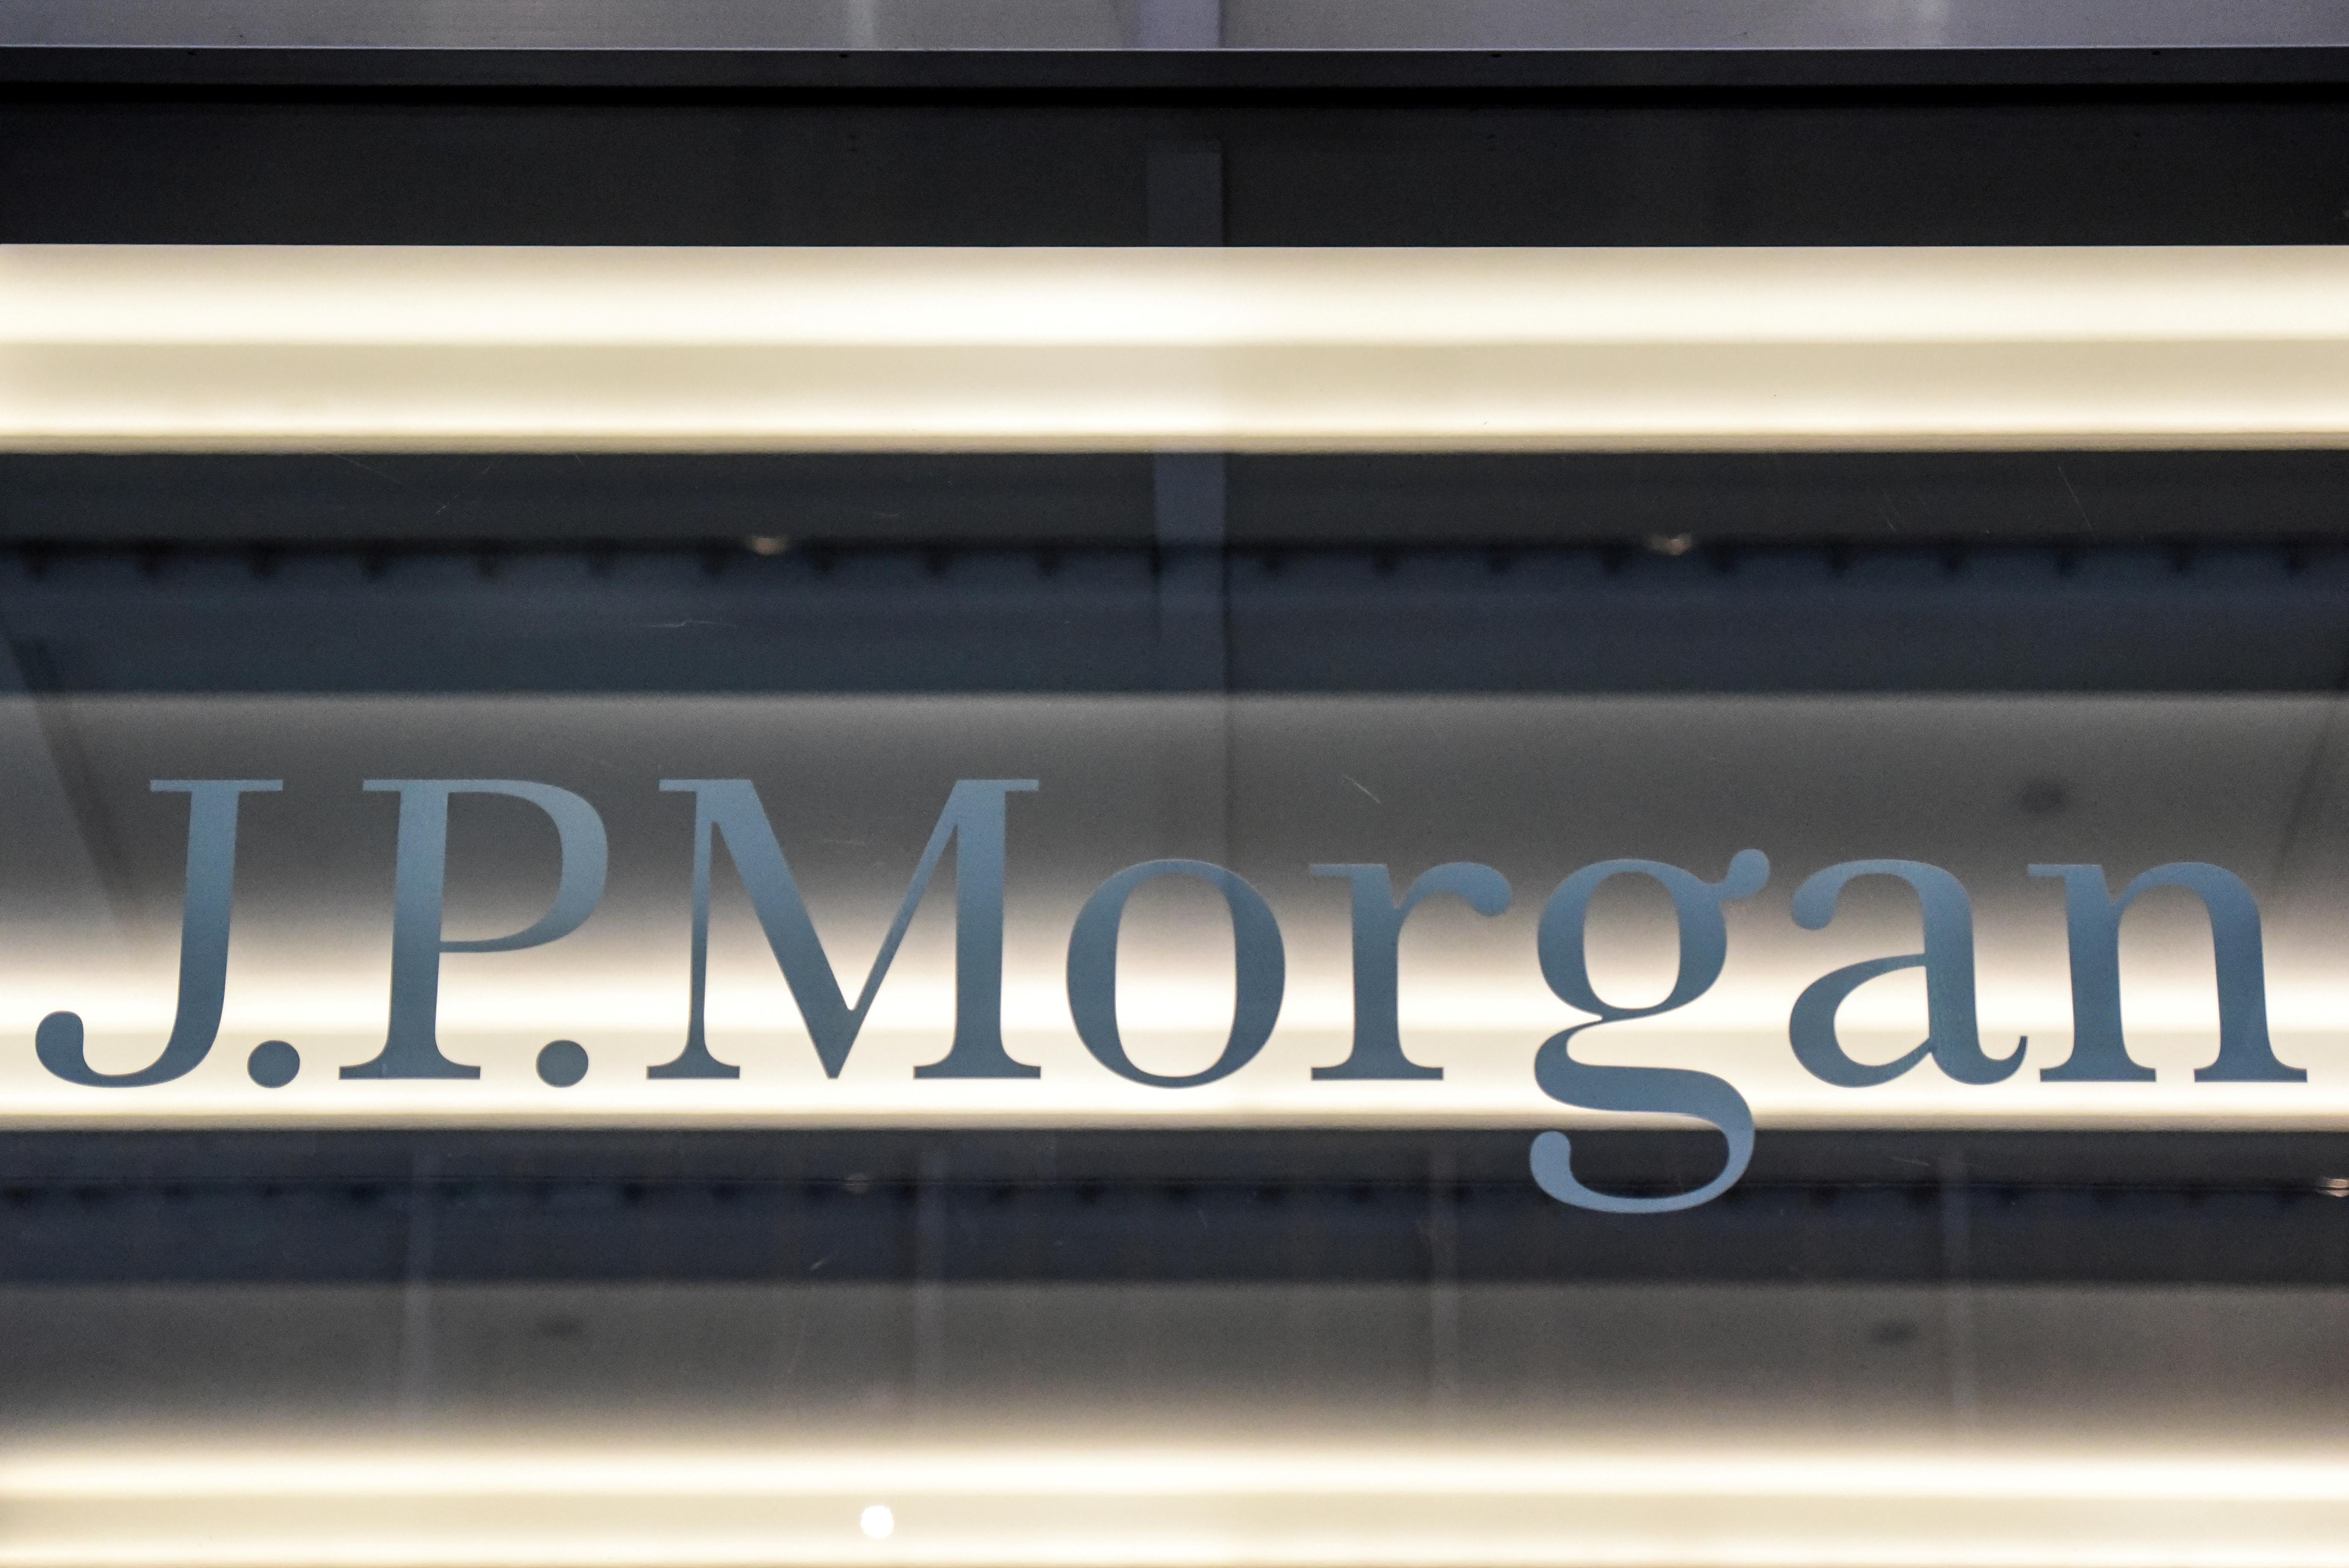 Too big to lend? JPMorgan cash hit Fed limits, roiling U.S. repos